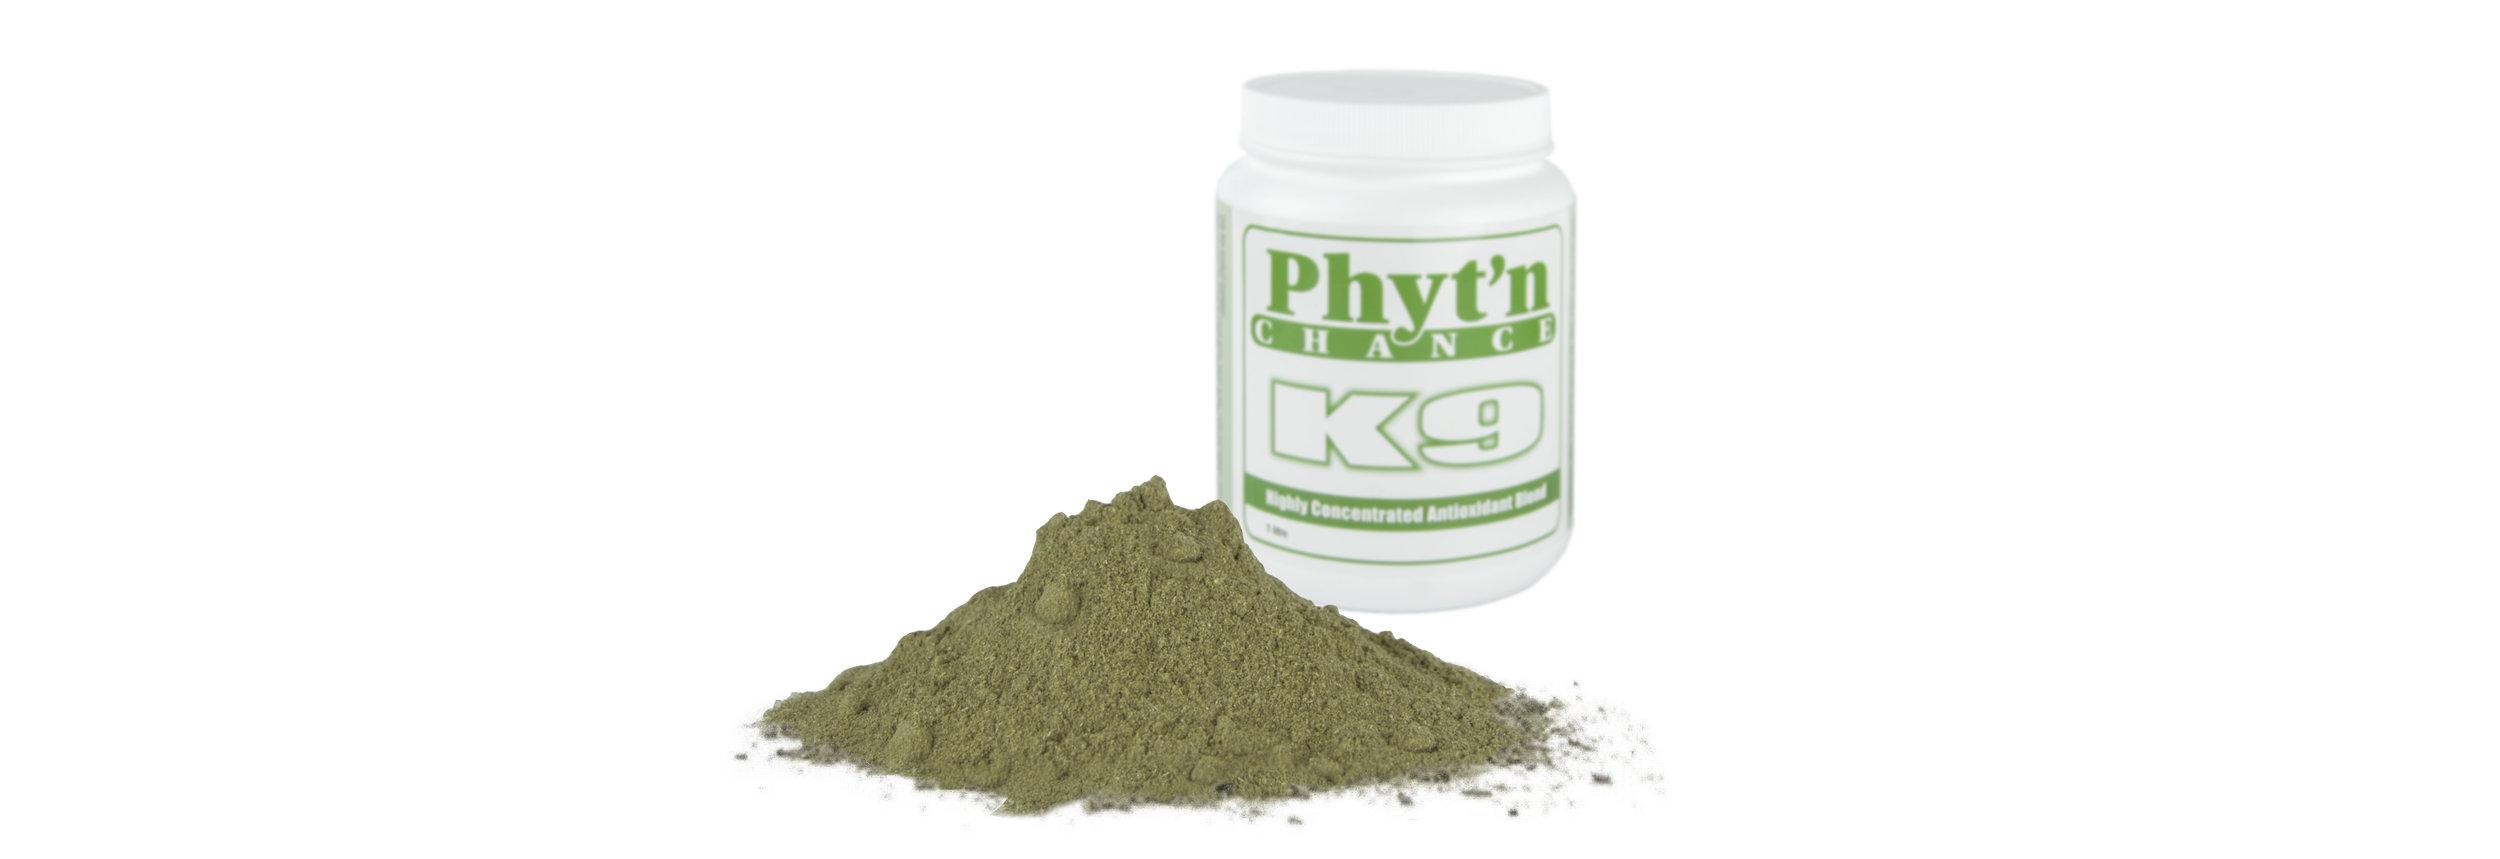 Phyt'n Powder.jpg